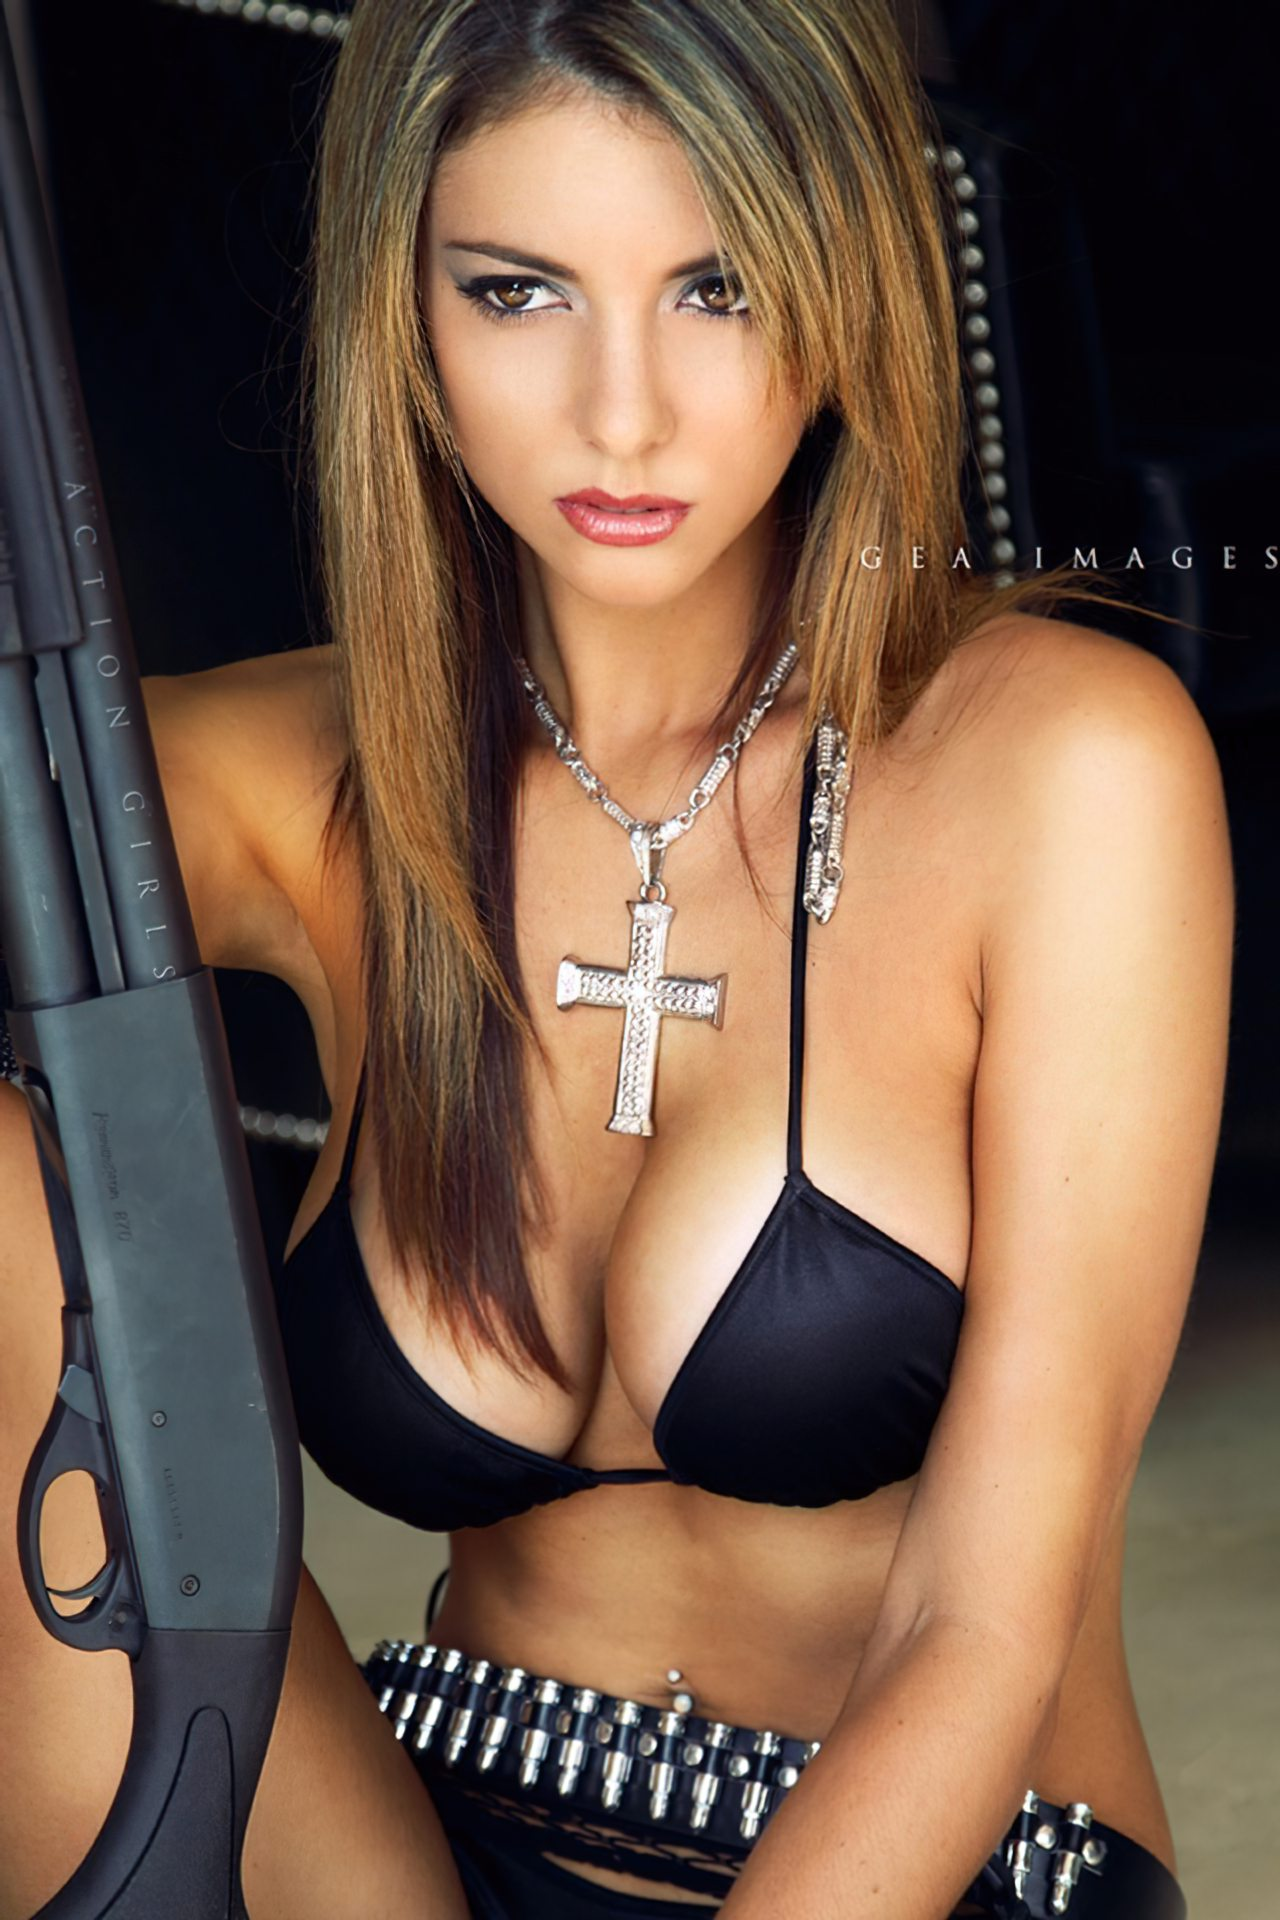 Lilly Lee Nua (26)